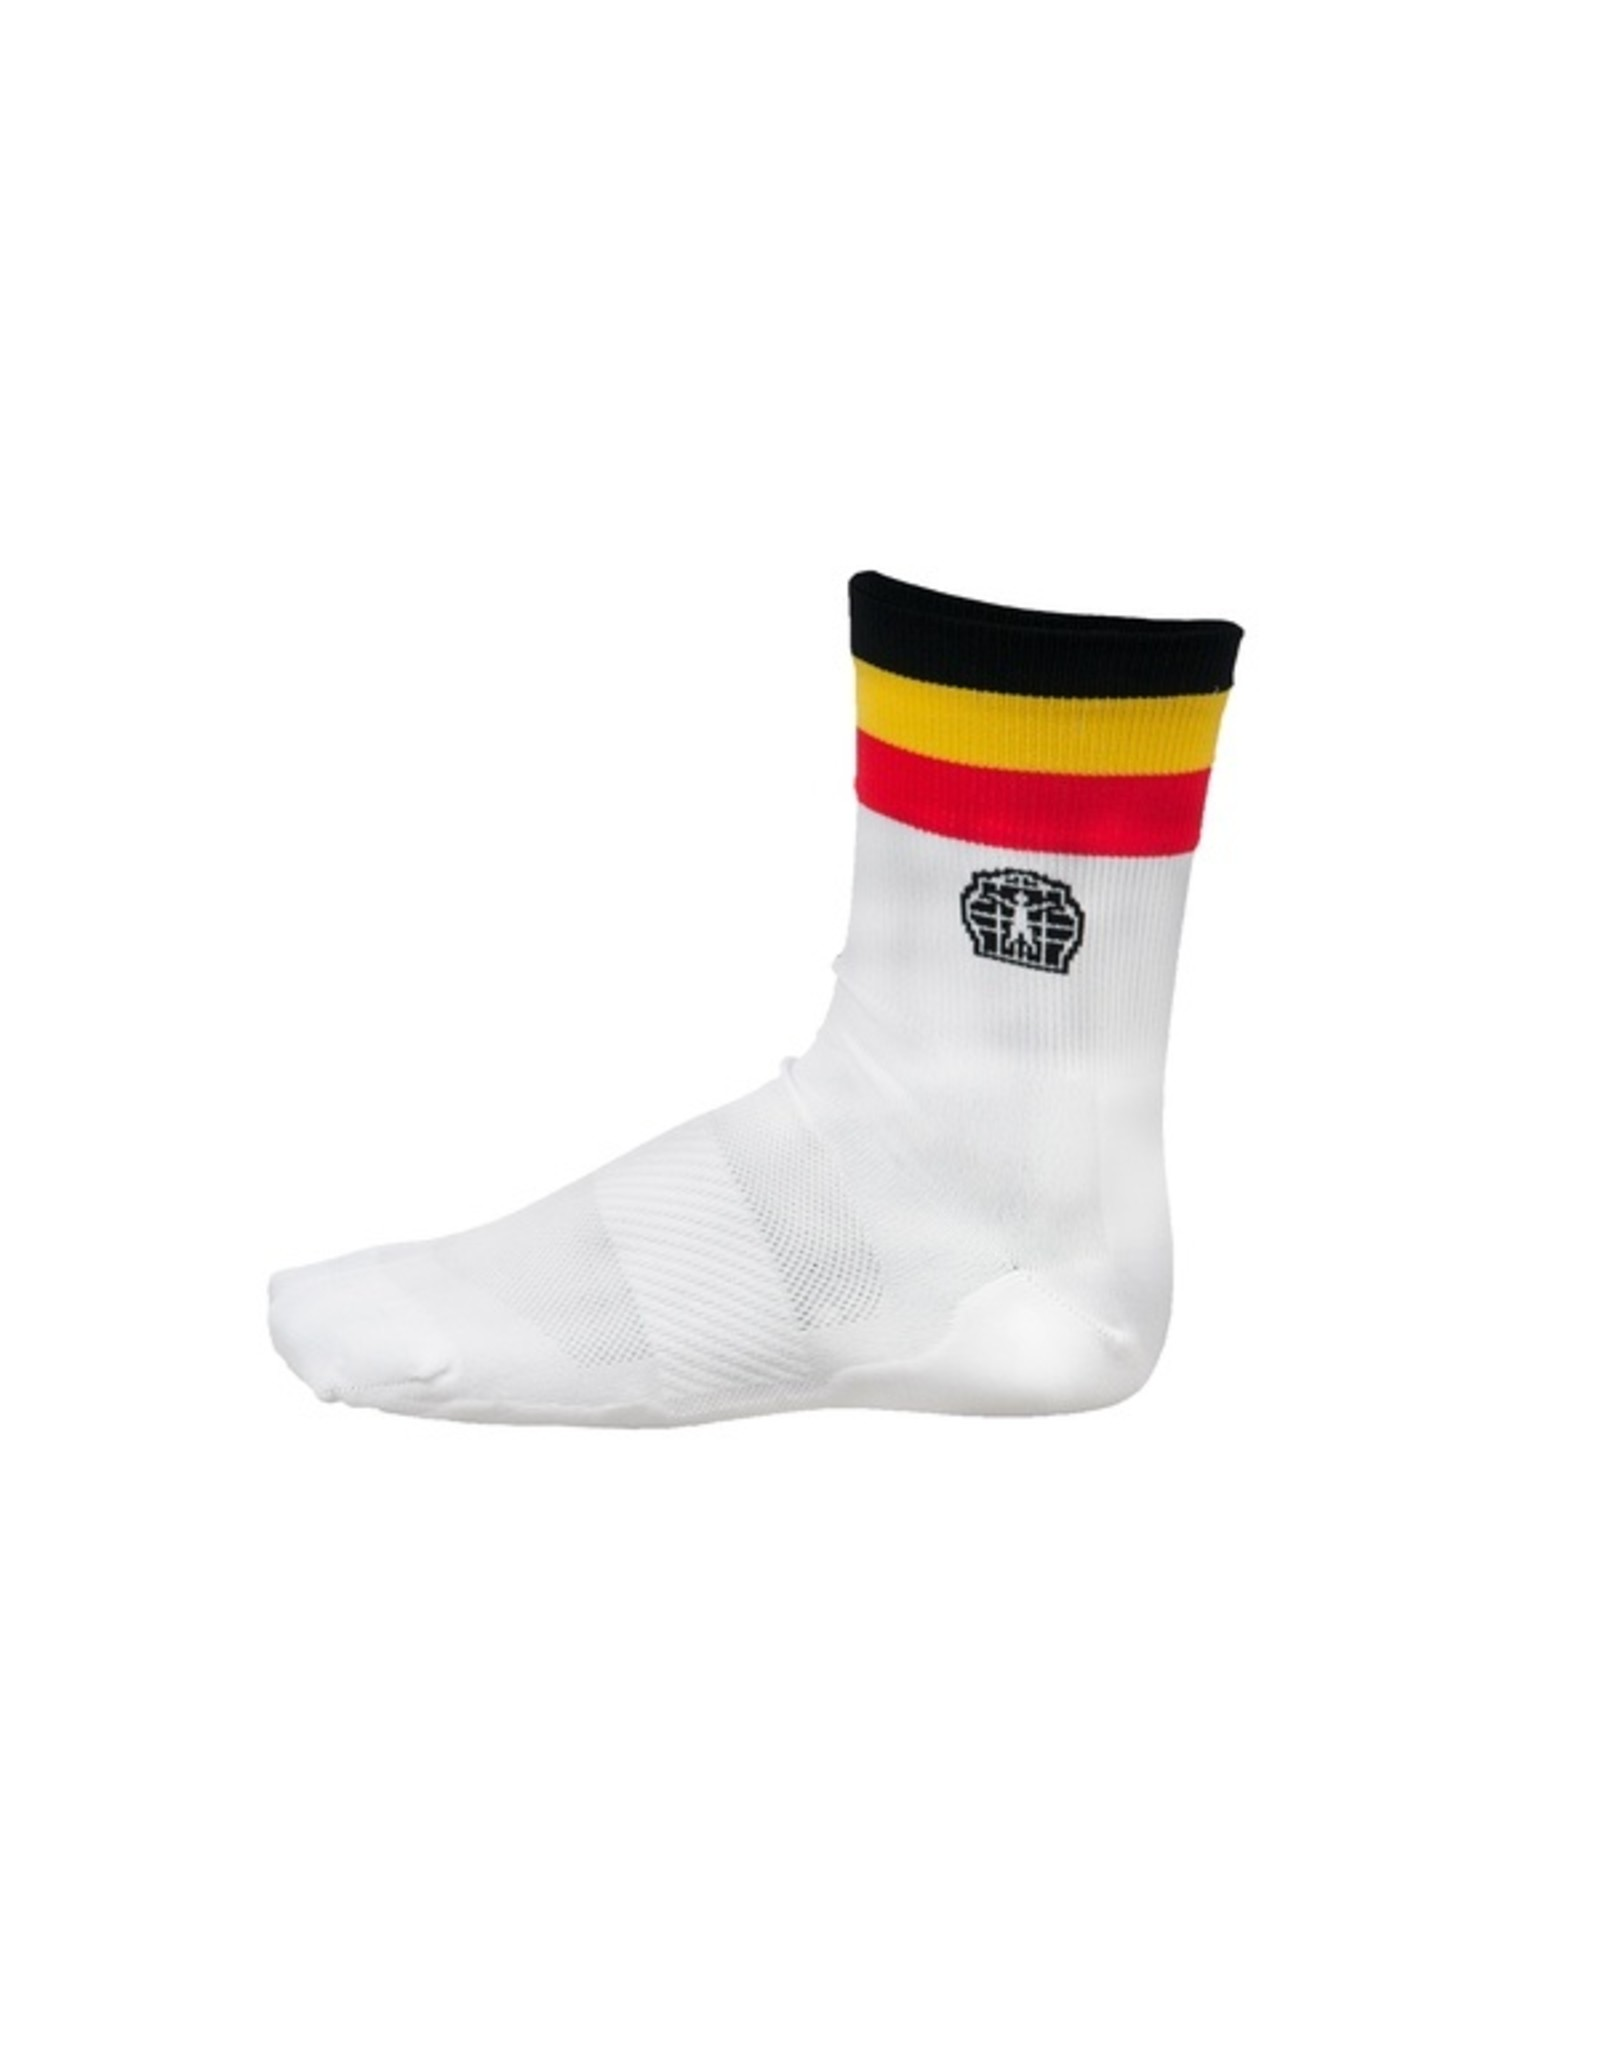 Bioracer '21, BIORACER, Belgium Sock White